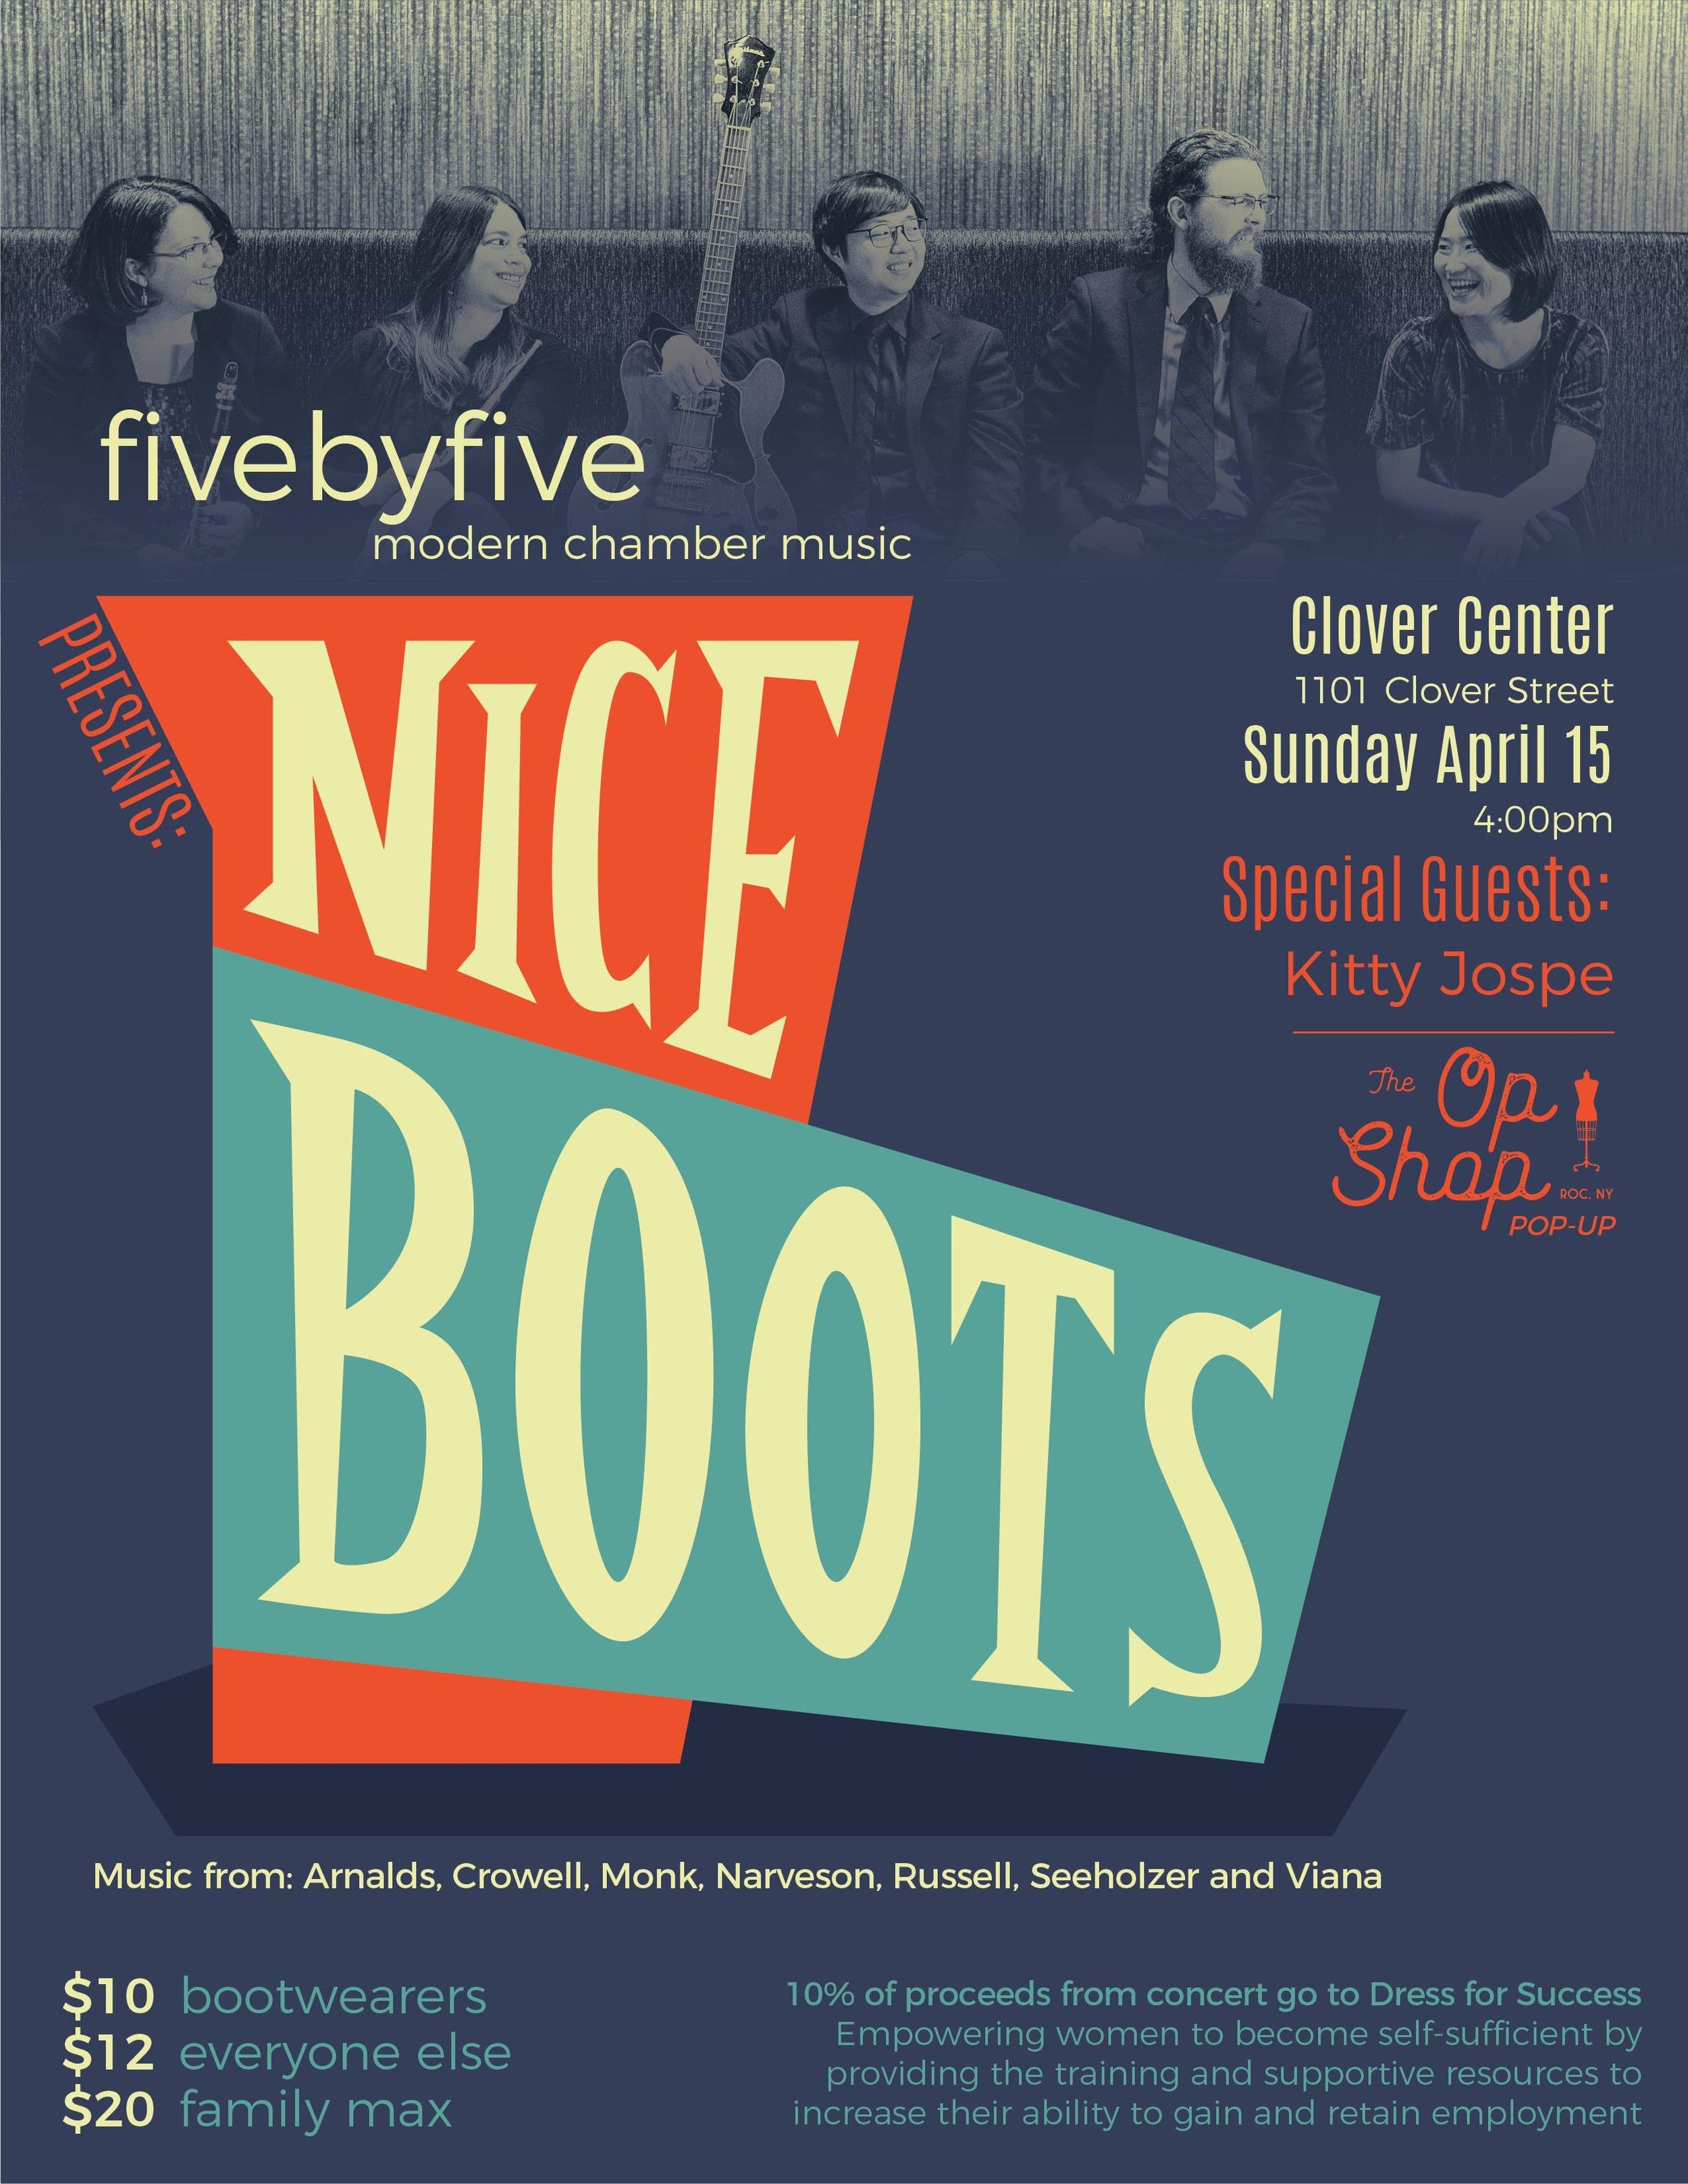 fivebyfive_niceboots-14 (3)- FINAL.jpg